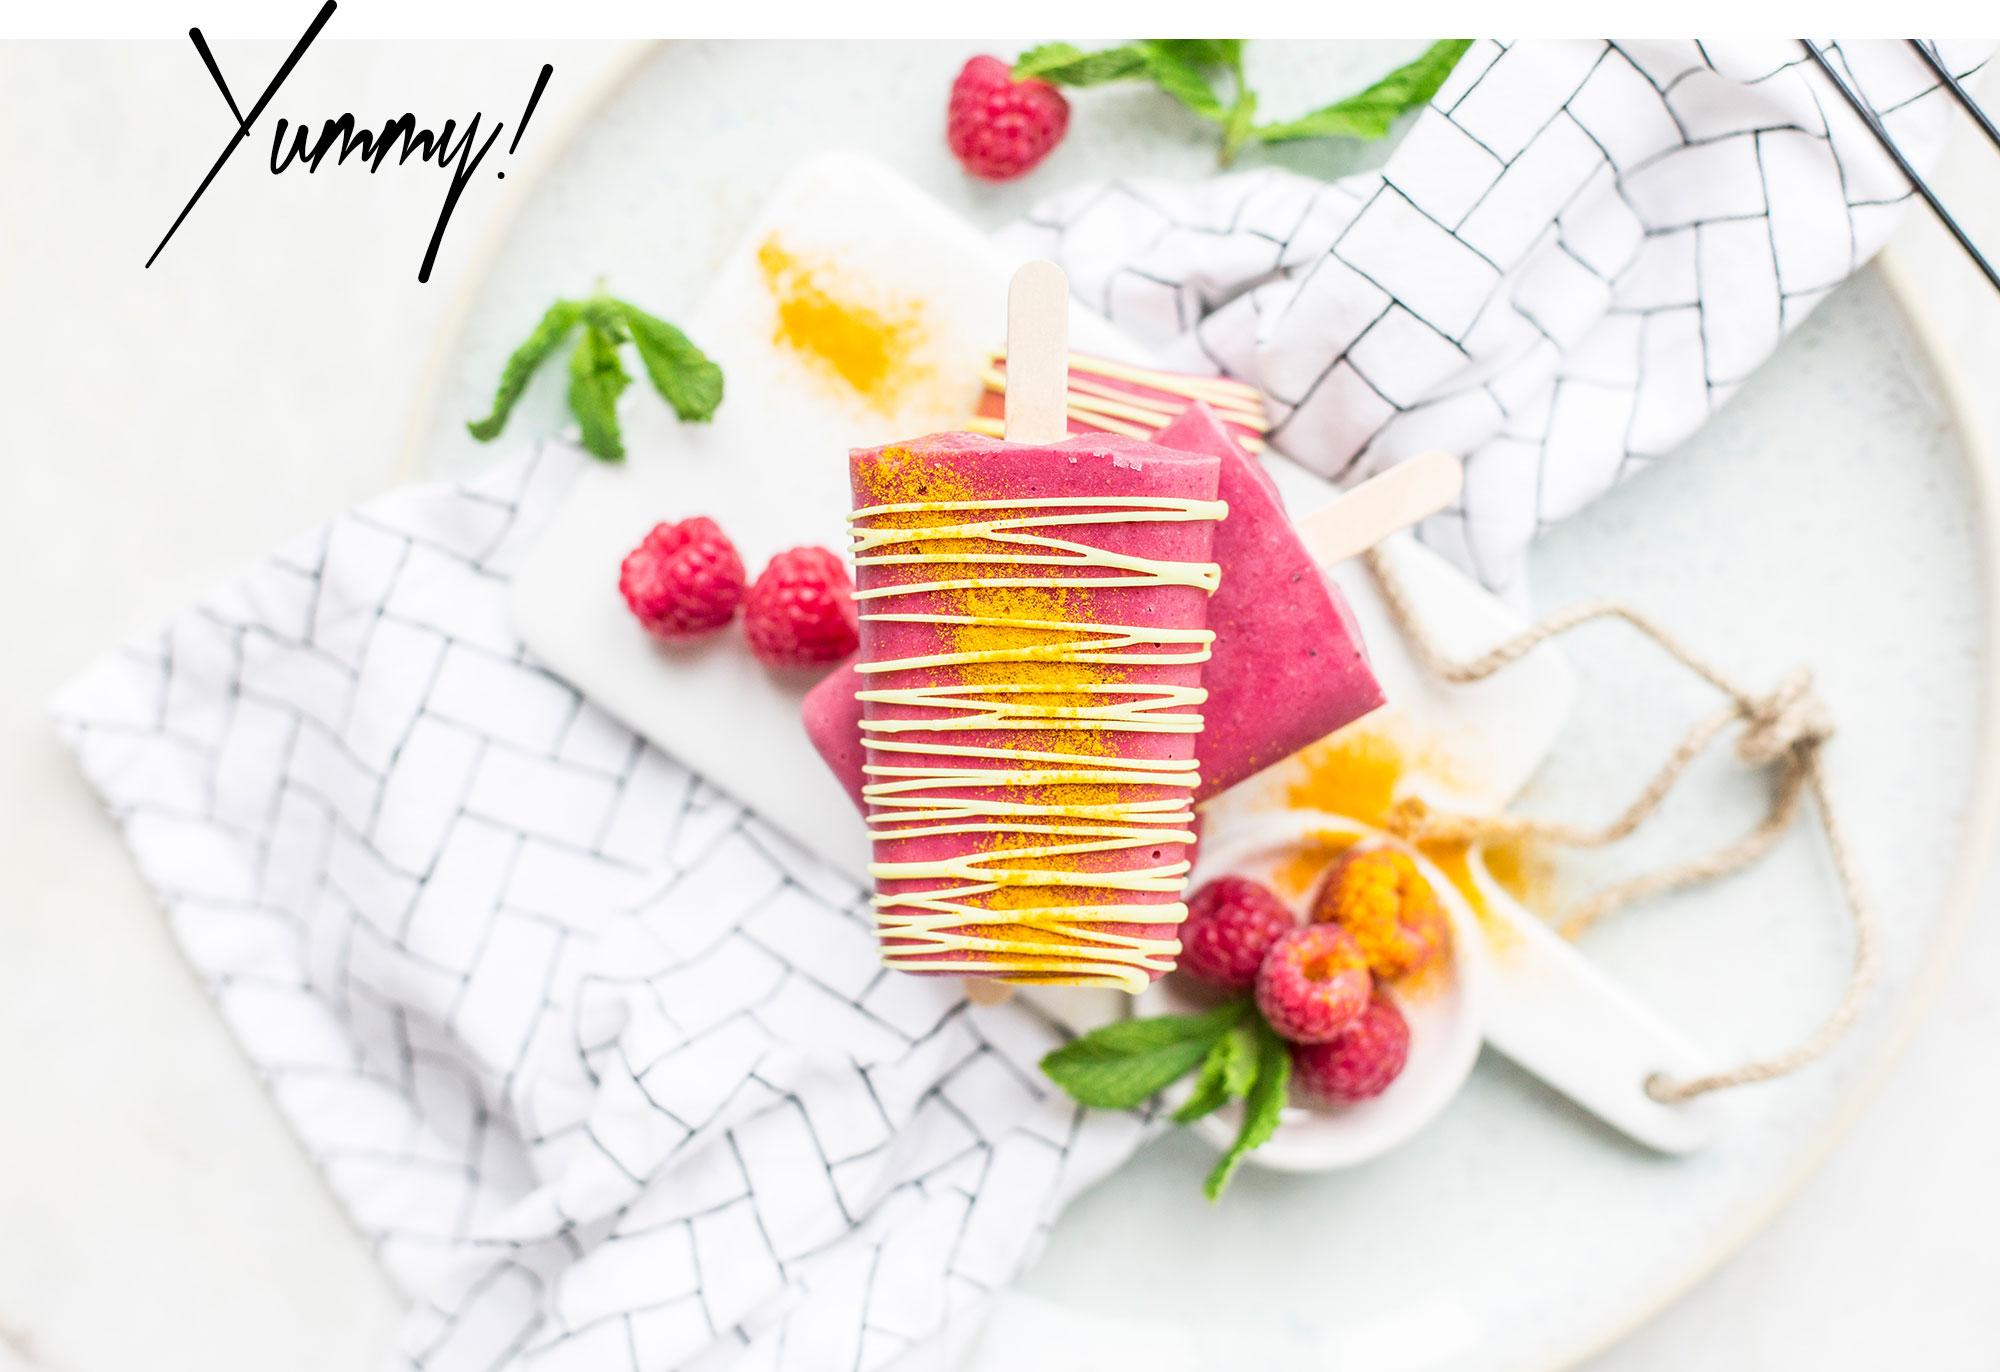 Femtastics-Rezept-Himbeer-Popsicles-weisse-Schokolade